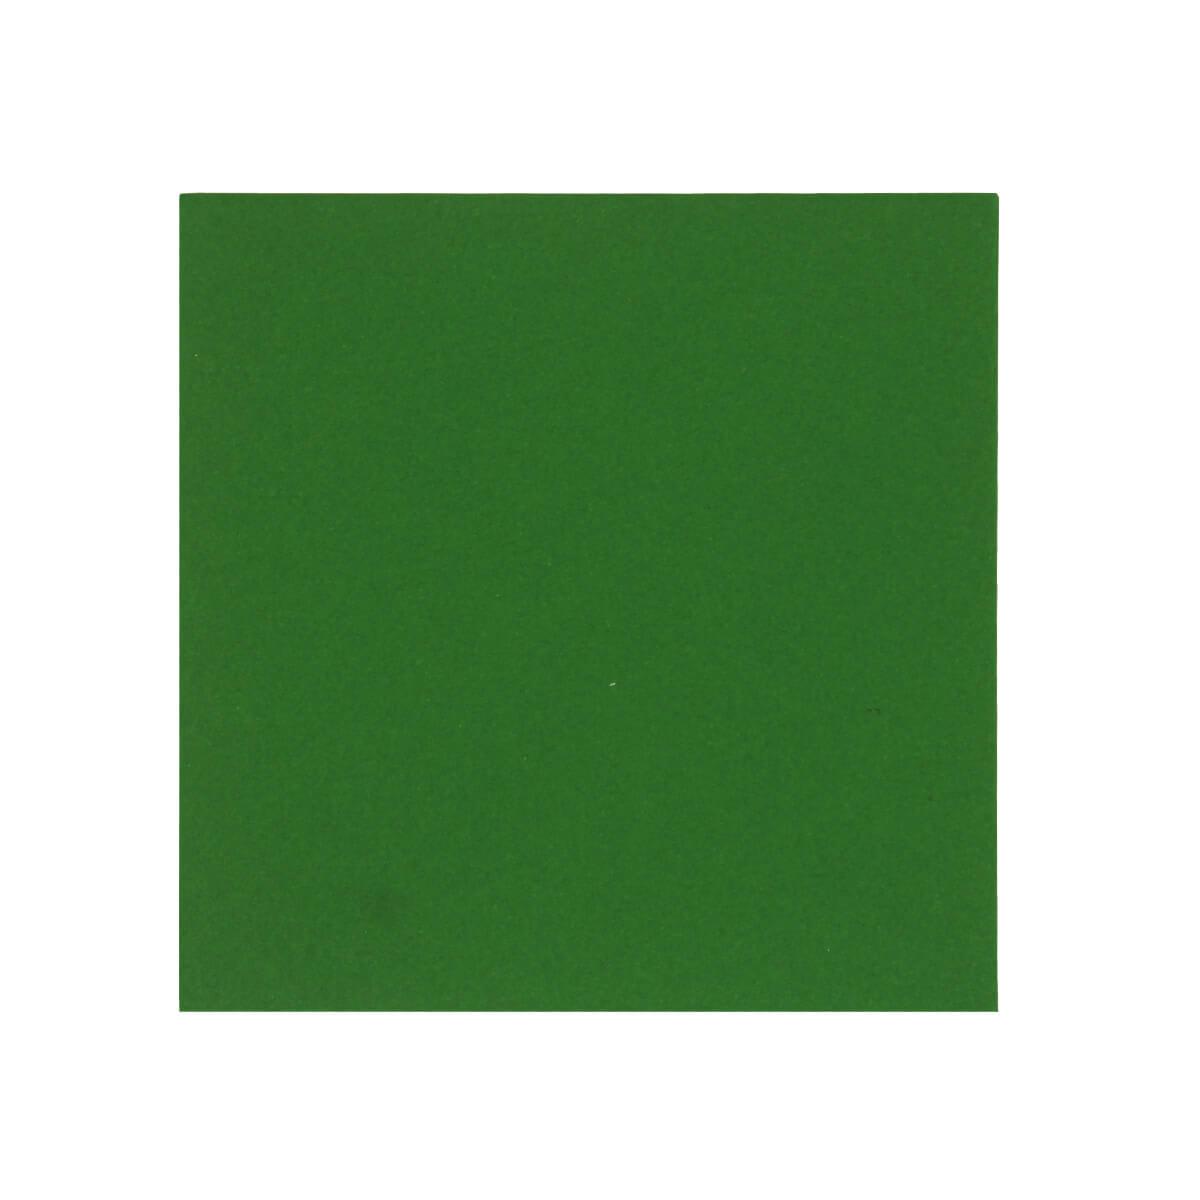 XMAS GREEN 100mm SQUARE ENVELOPES